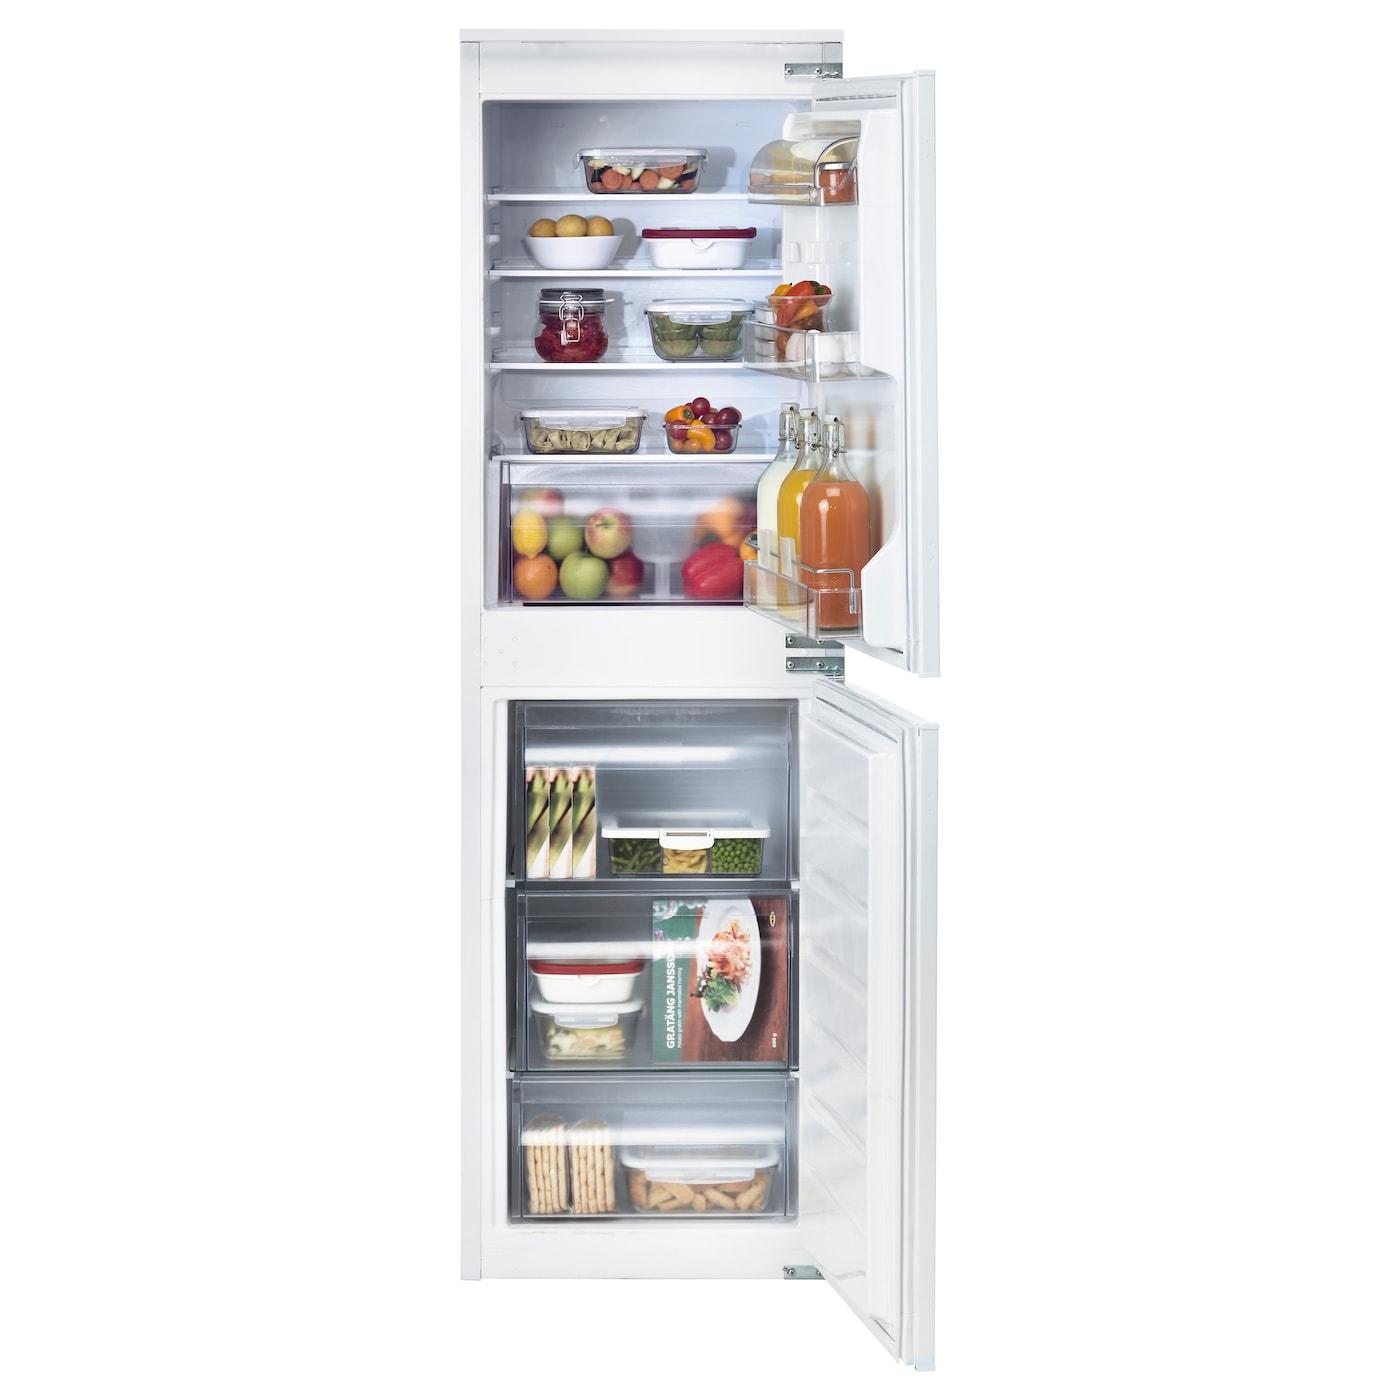 ISIGT Integrated fridge/freezer A+ White 152/109 l - IKEA